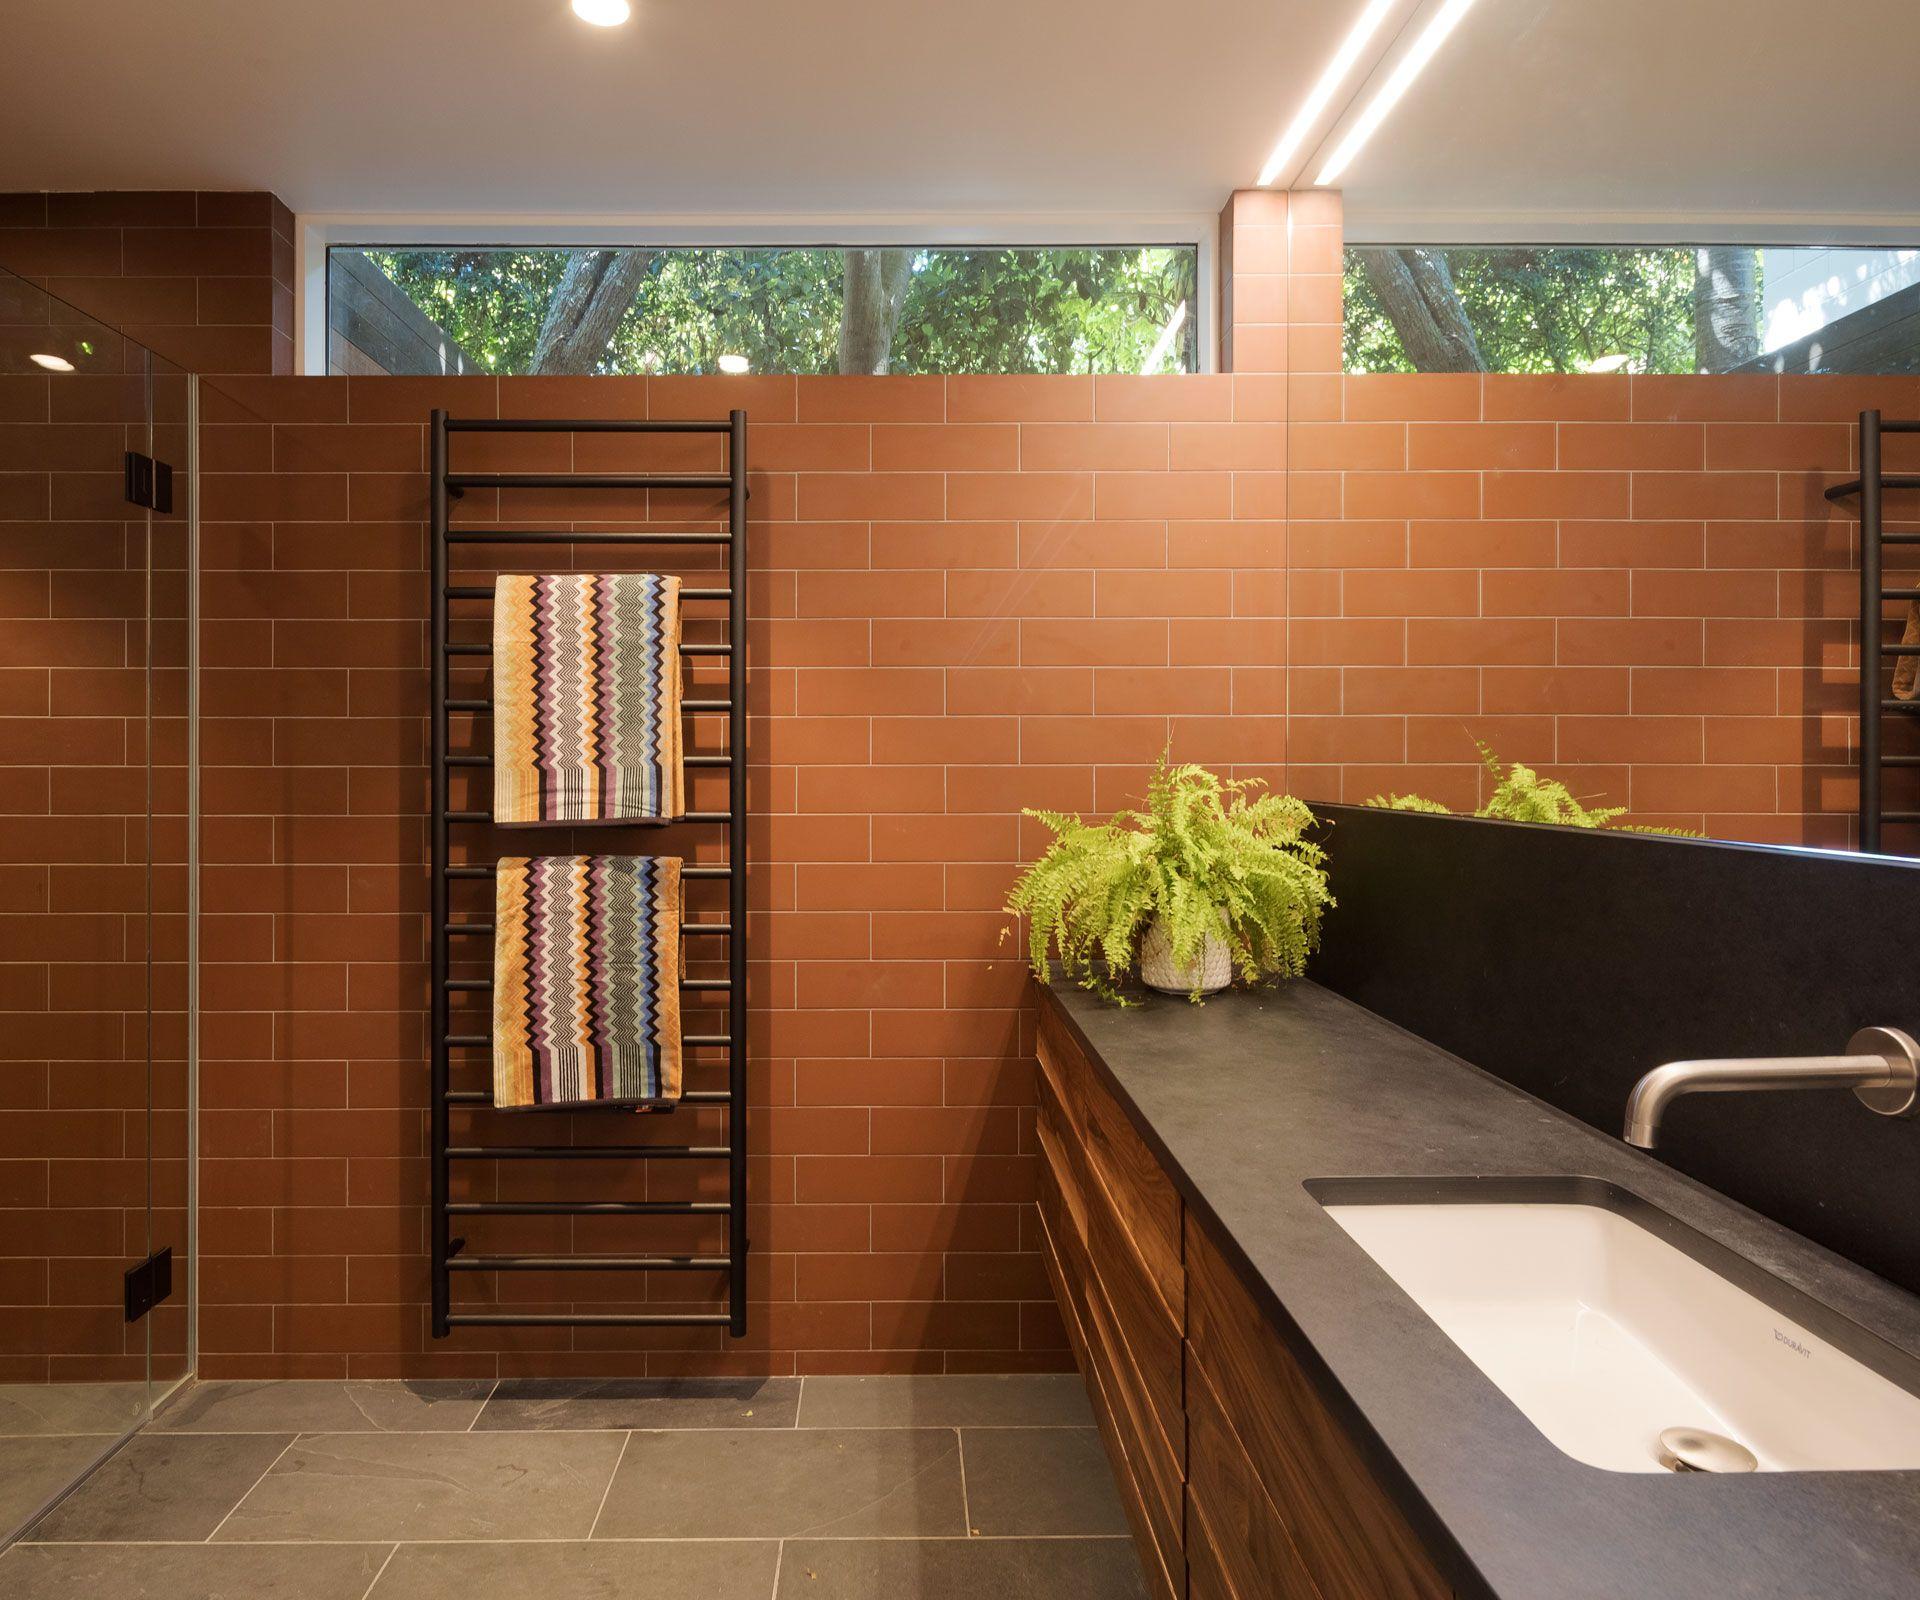 architect julian guthrie creates a rustic bathroom on bathroom renovation ideas nz id=79678